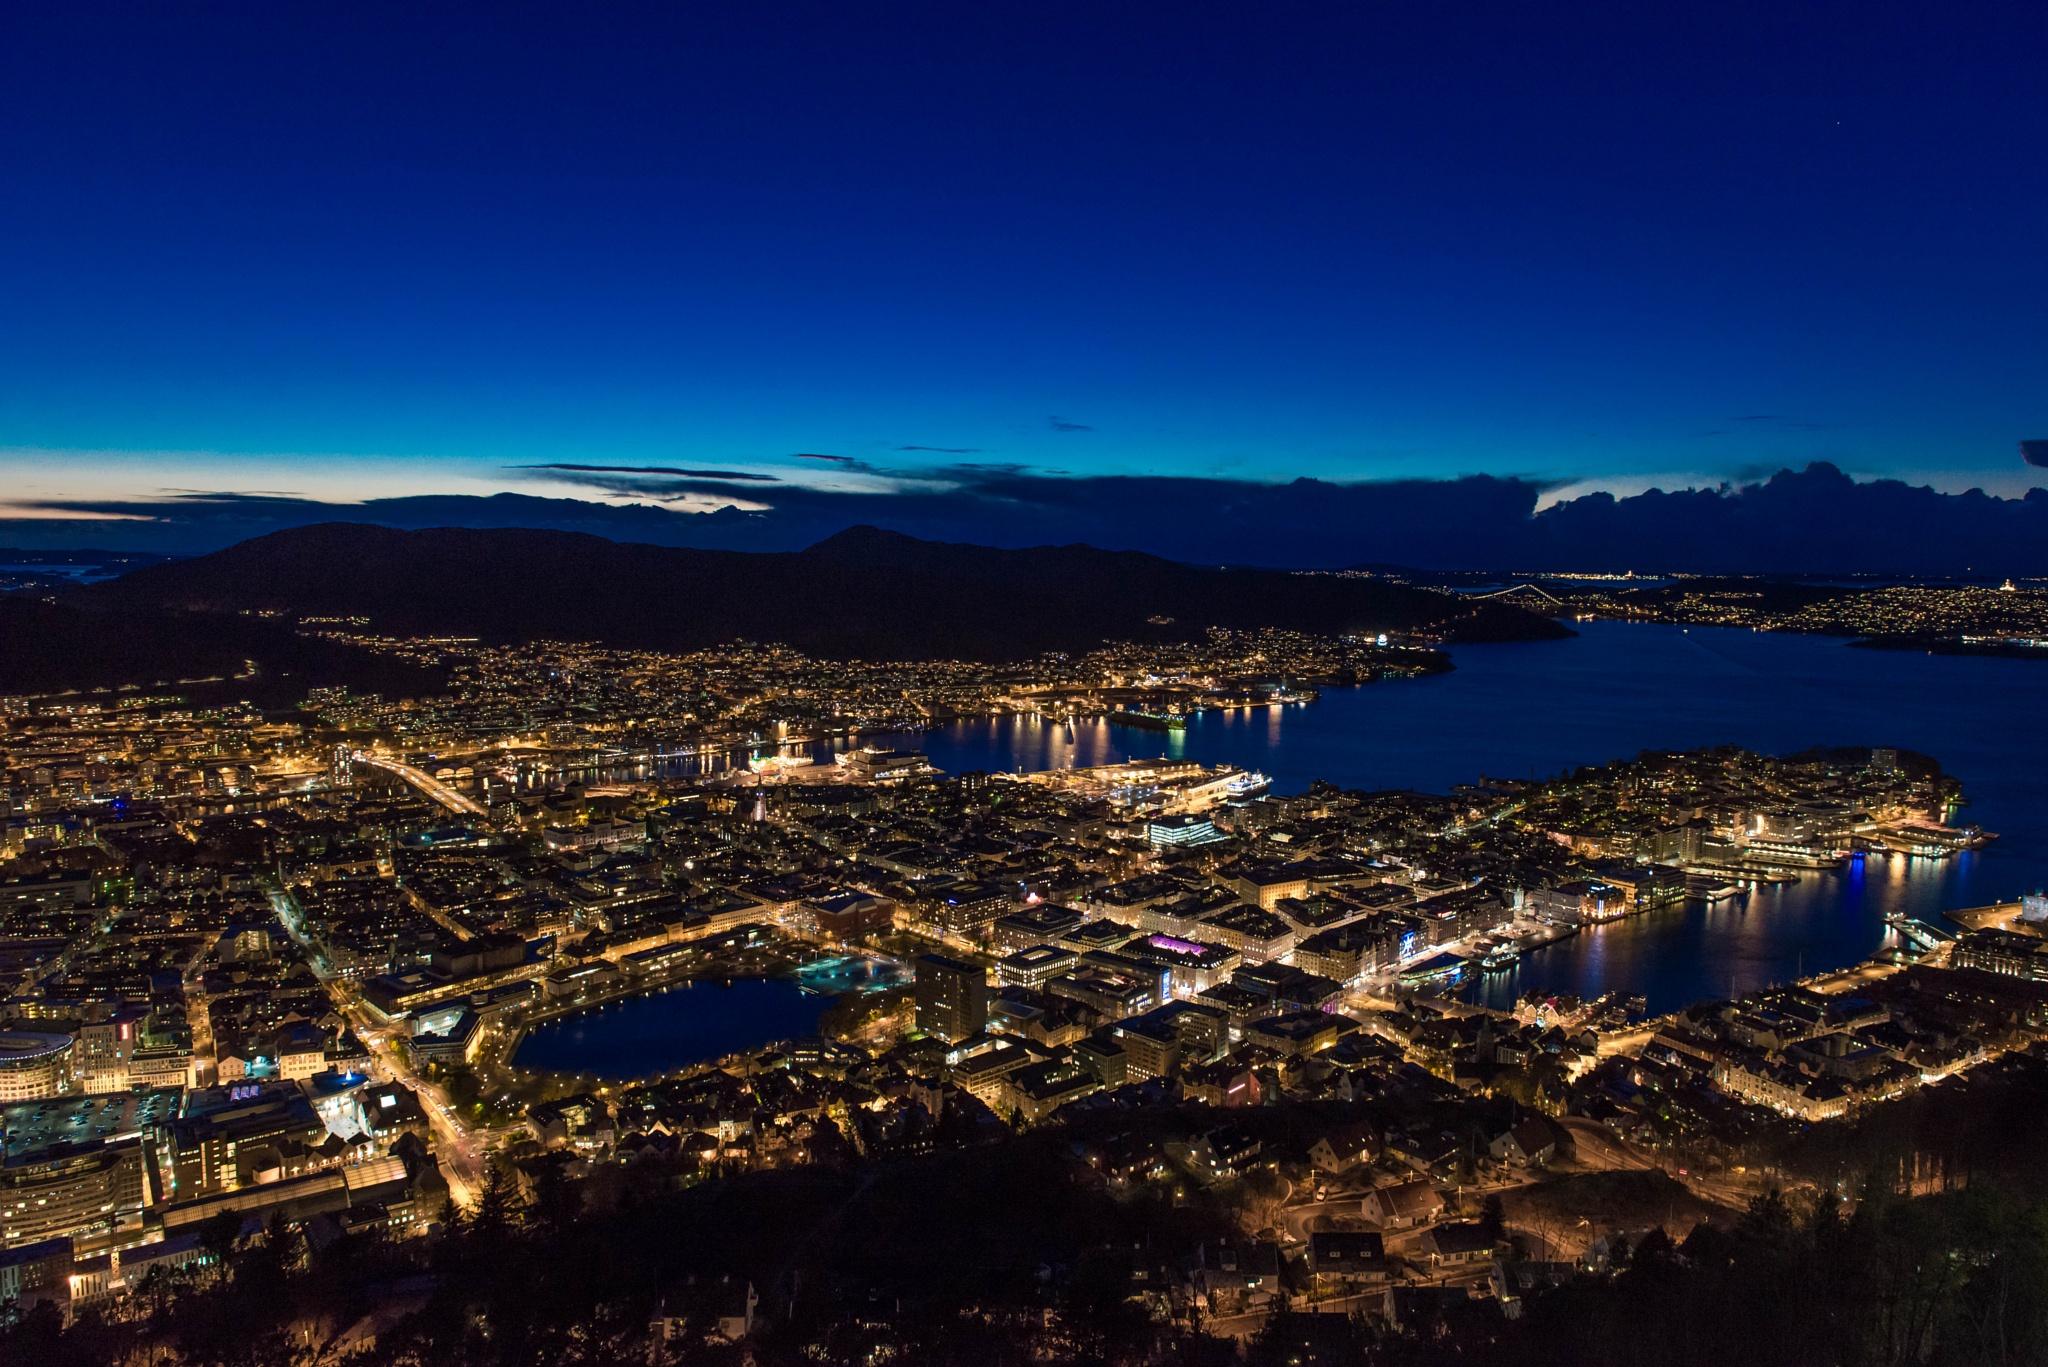 Night Bergen city  by Tomas Ziaugra